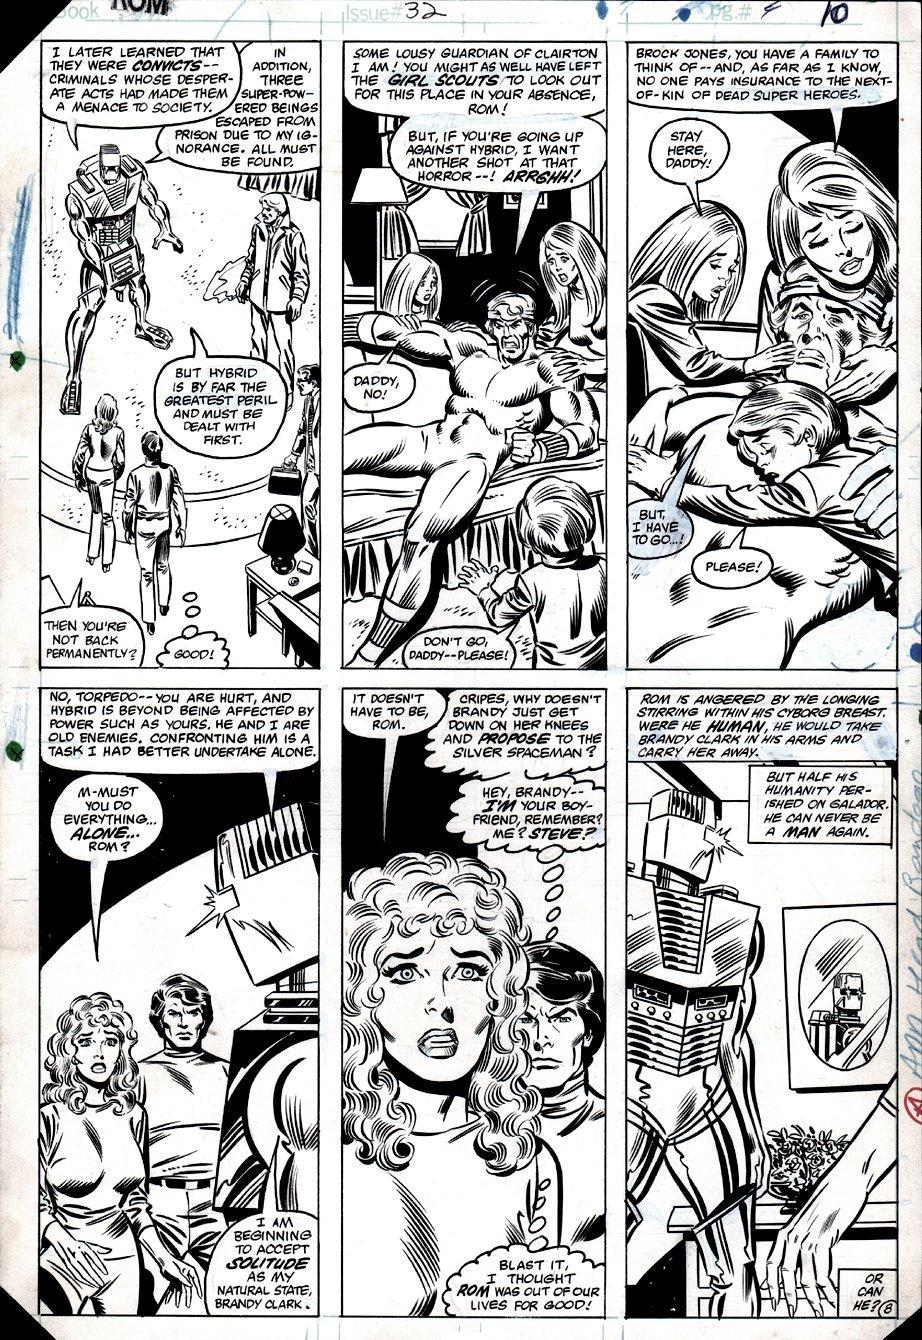 ROM #32 p 8 (ROM, Torpedo, Brandy Clark, Steve Jackson!) 1982